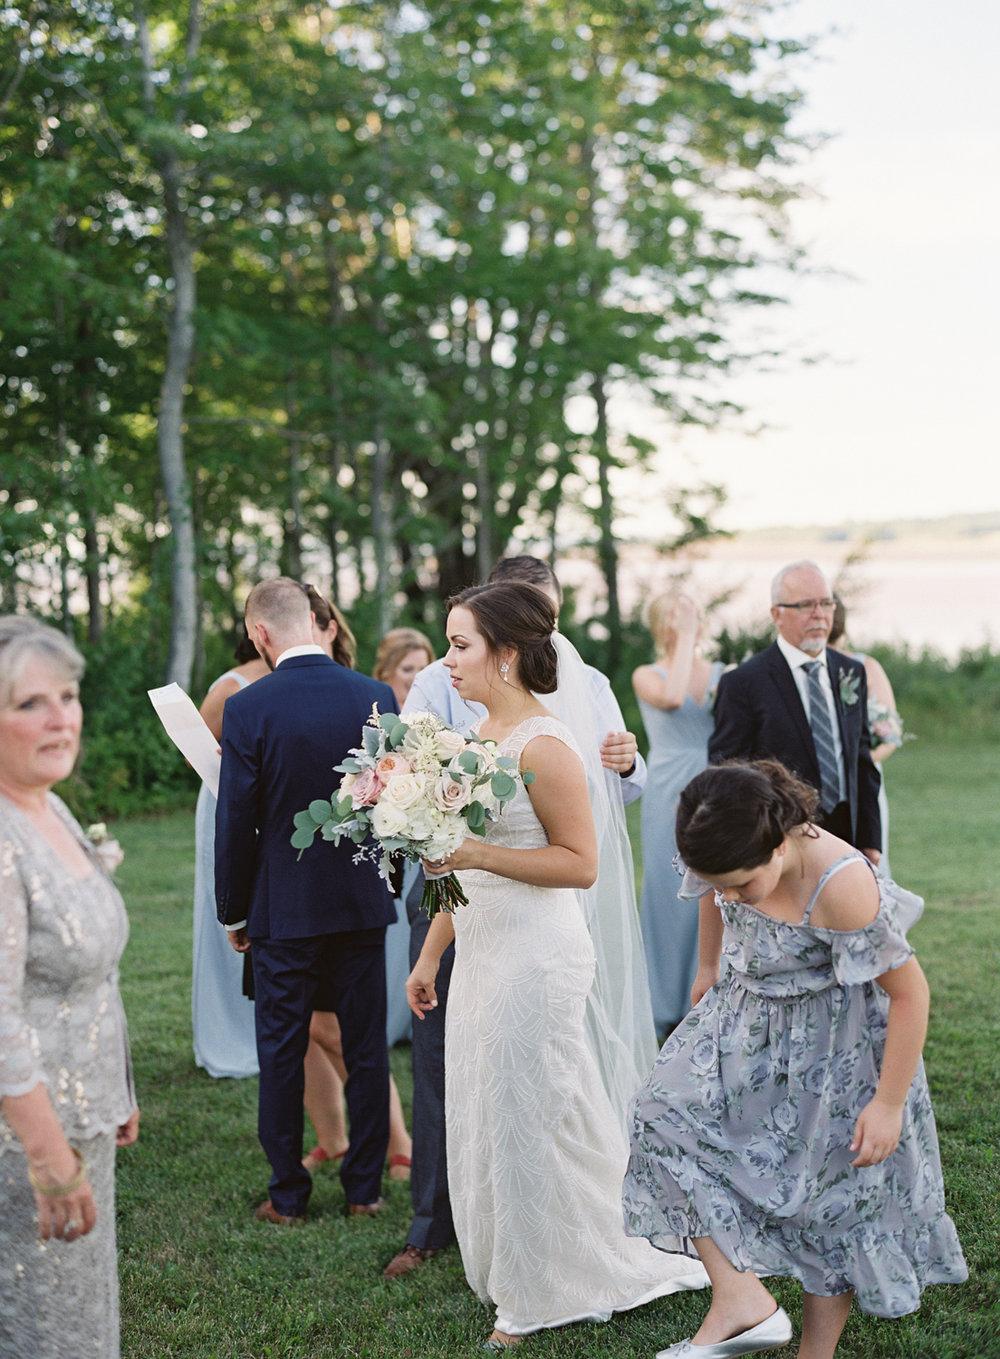 Jacqueline Anne Photography - Nova Scotia Backyard Wedding-72.jpg